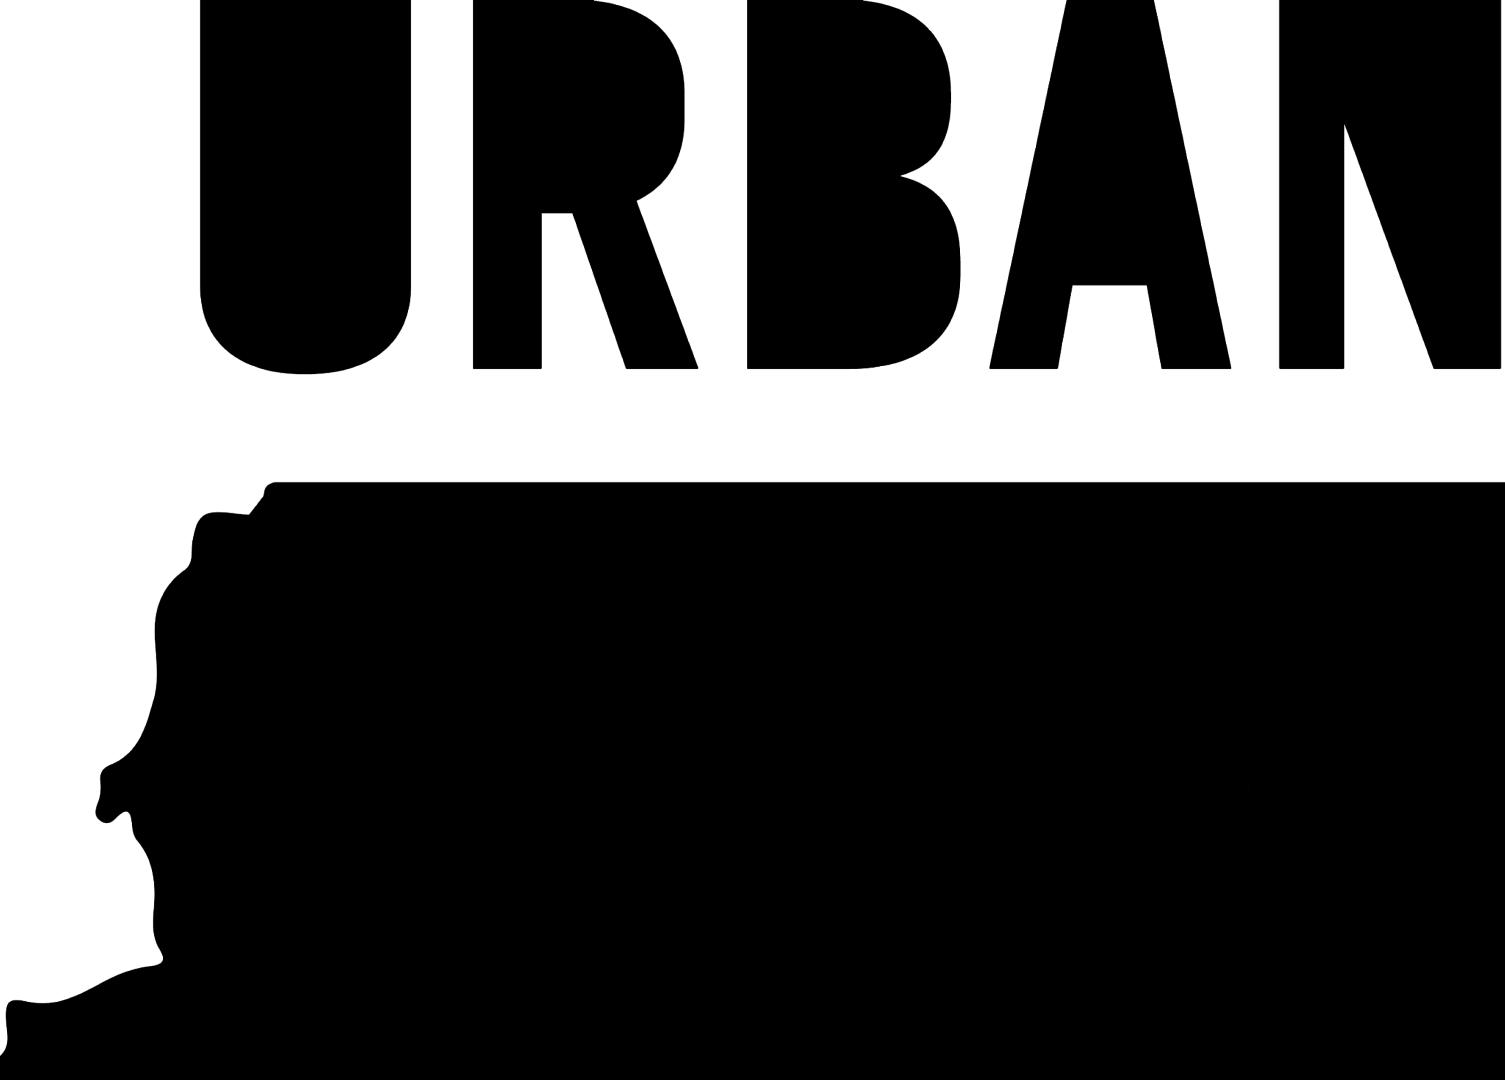 Logo-1-copy.png